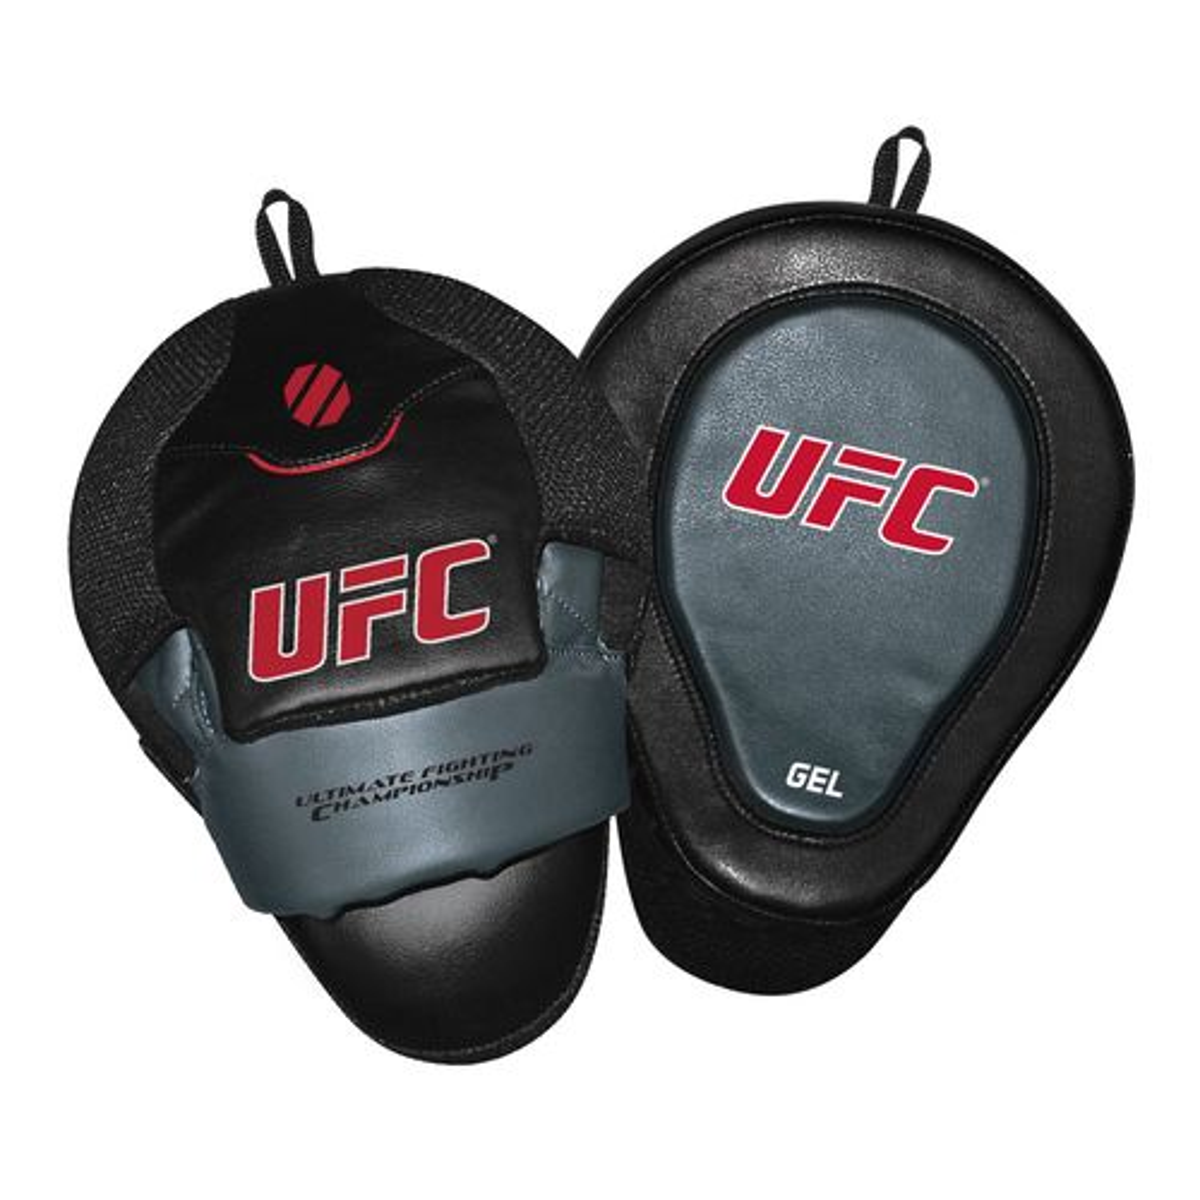 UFC® Gel Punch Mitt